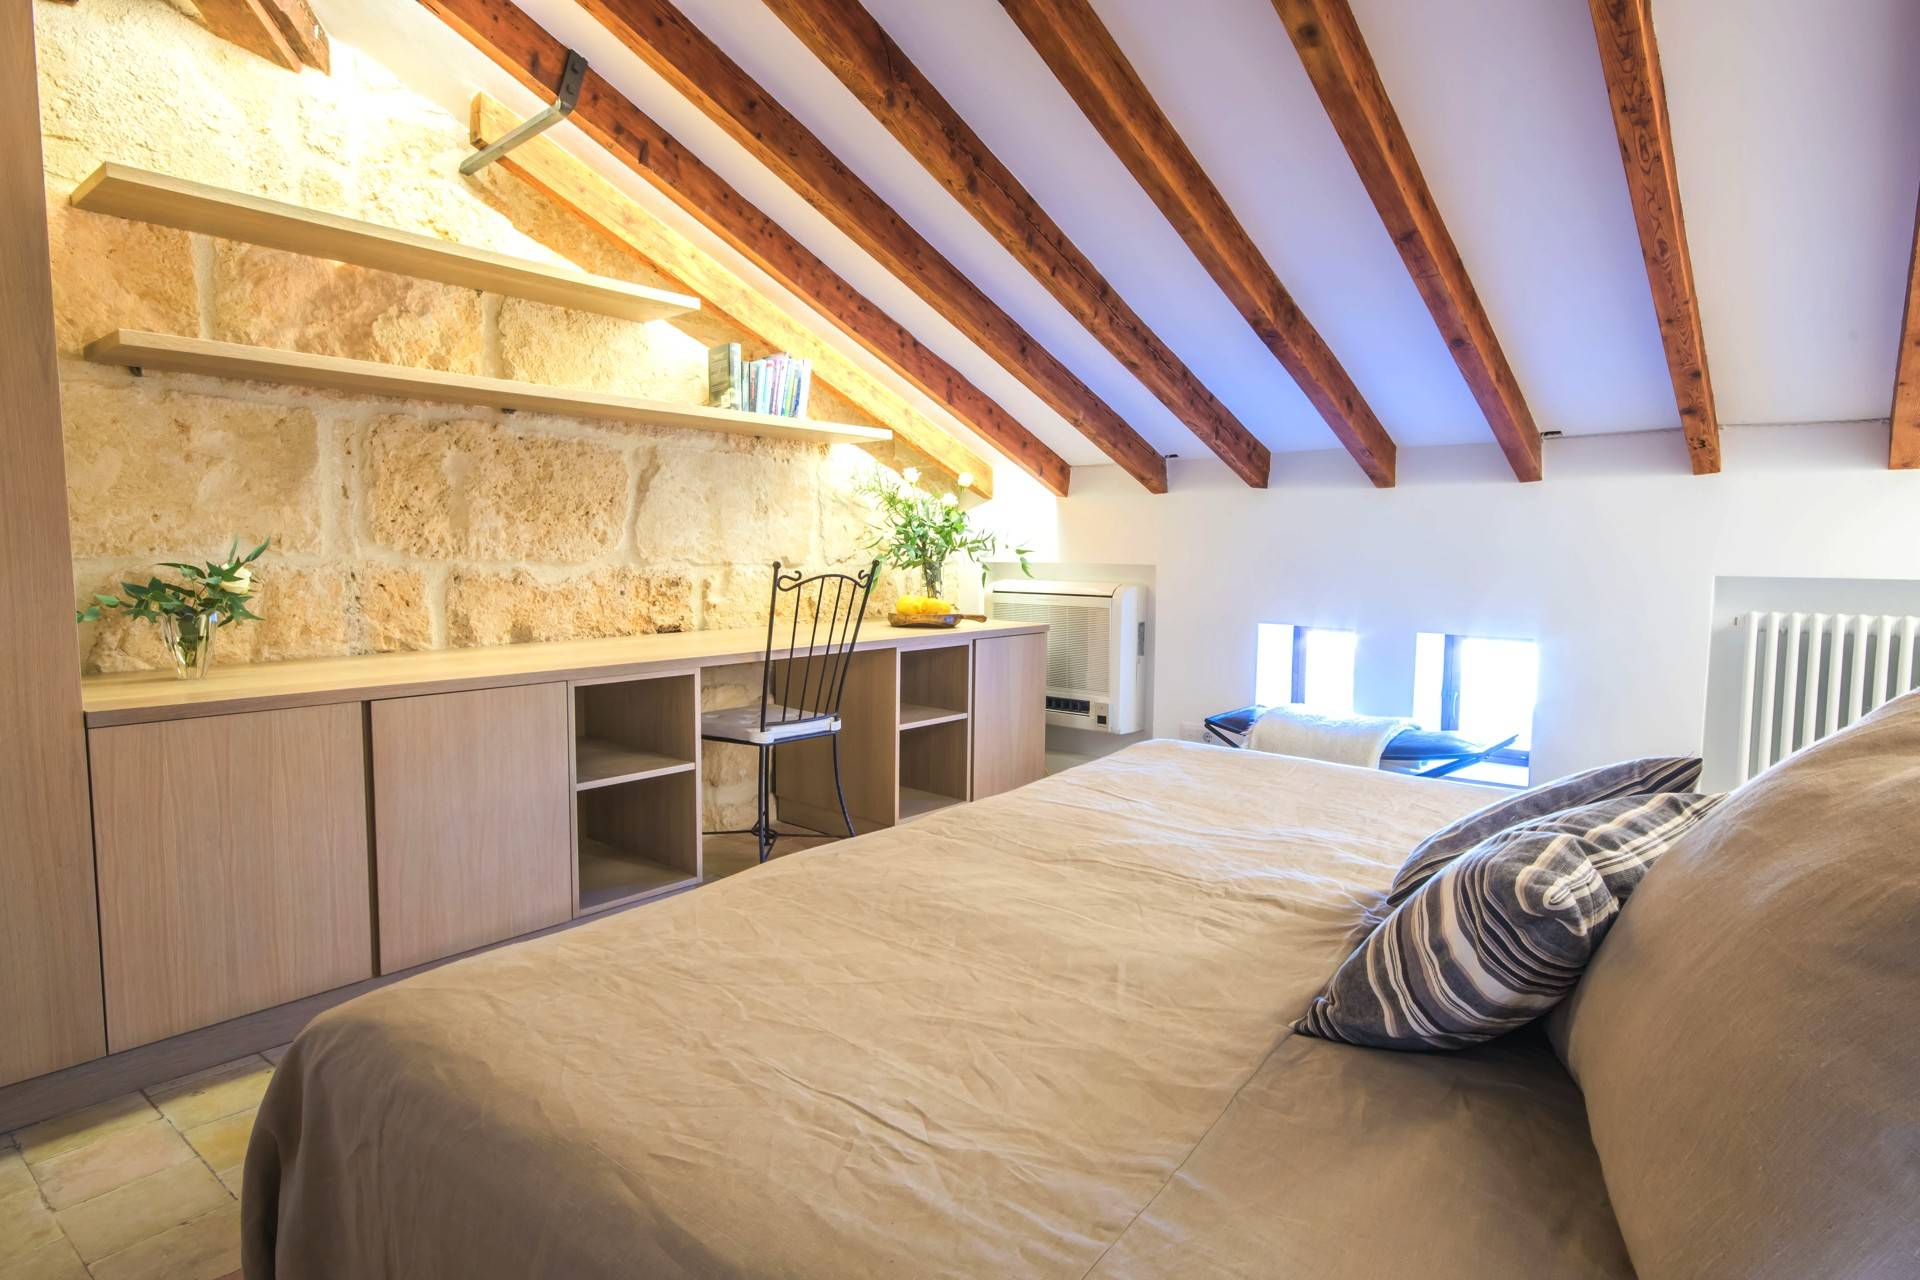 01-257 Luxus Ferienhaus Mallorca Südwesten Bild 23